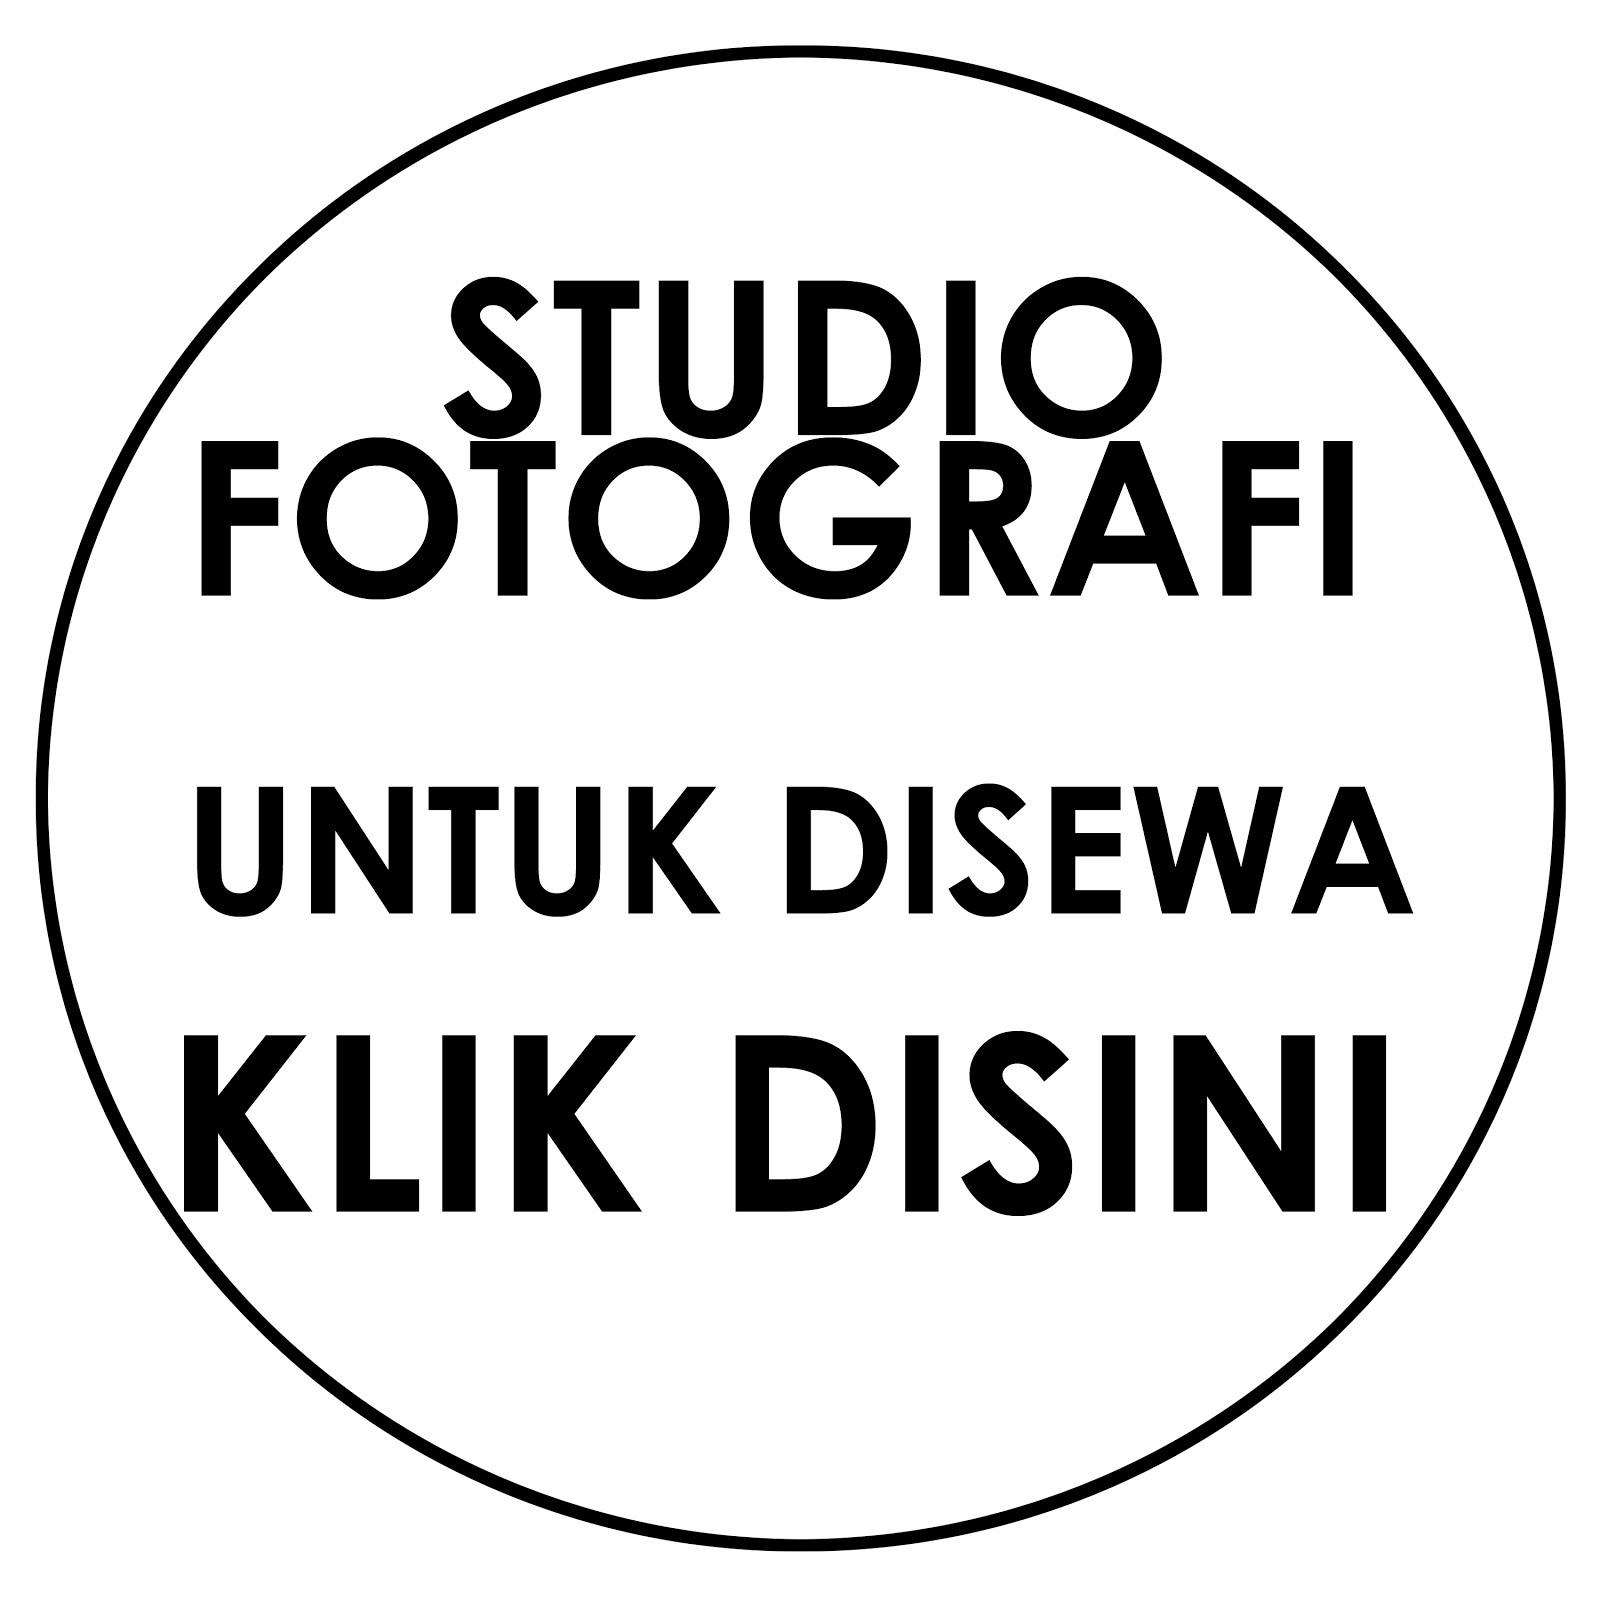 STUDIO FOTOGRAFI UNTUK DISEWA